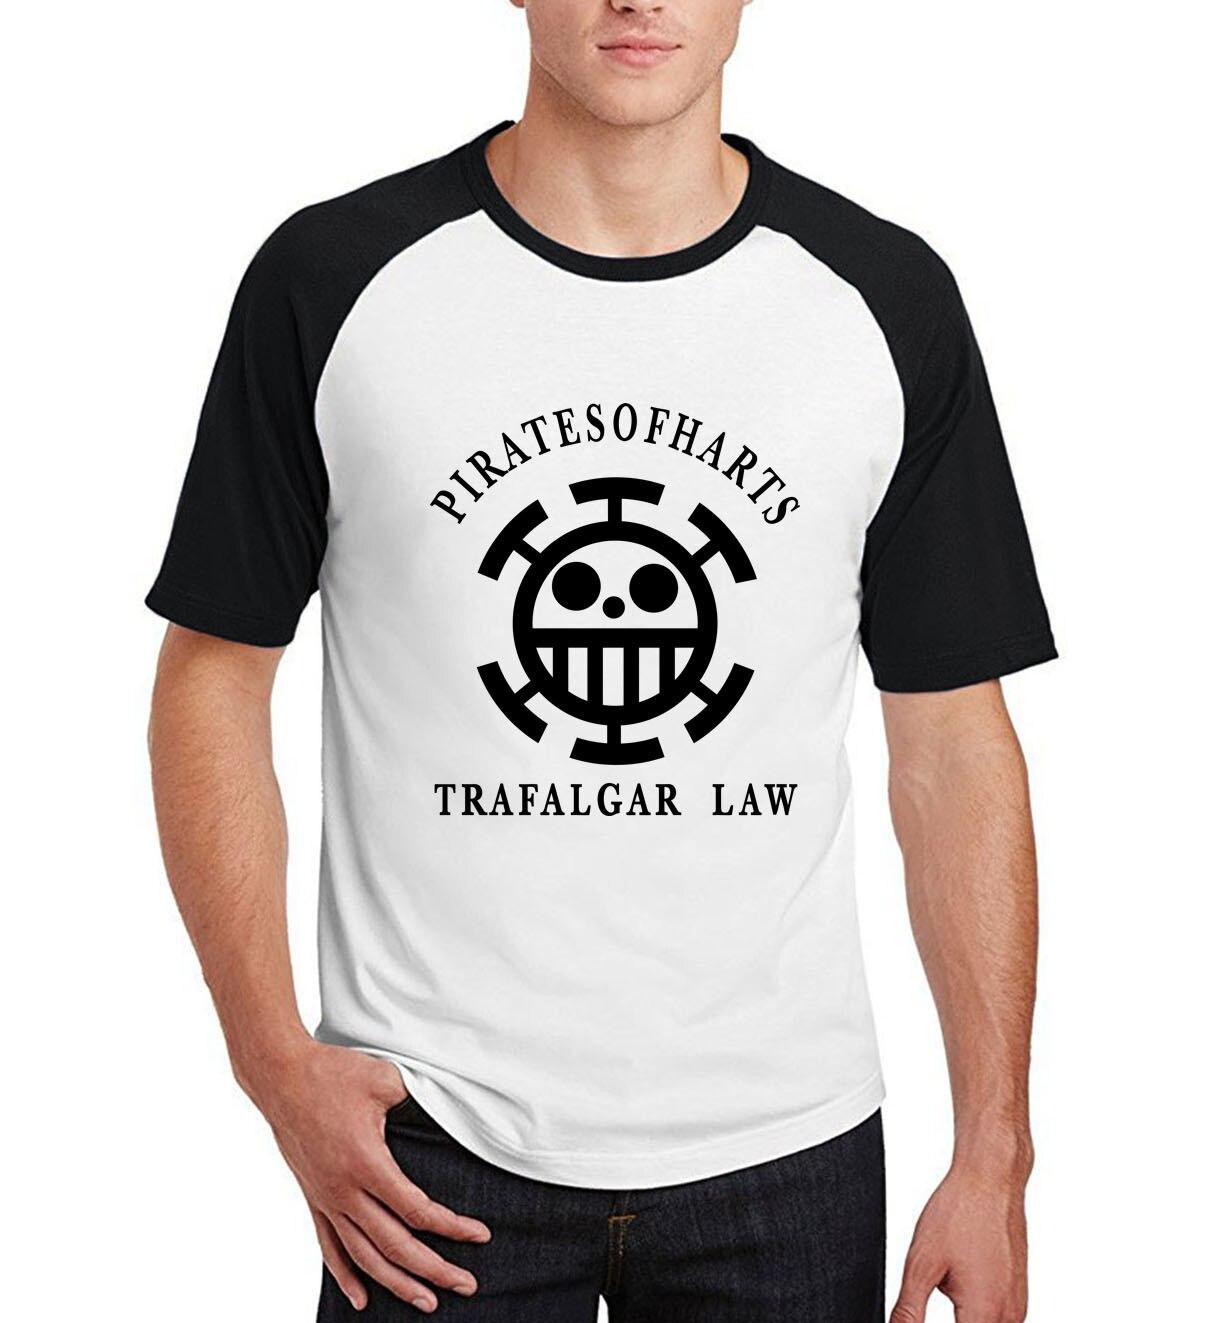 men funny bodybuilding printing t-shirt 2019 funny hot sale short sleeve camiseta fitness raglan cotton tee shirt homme summer